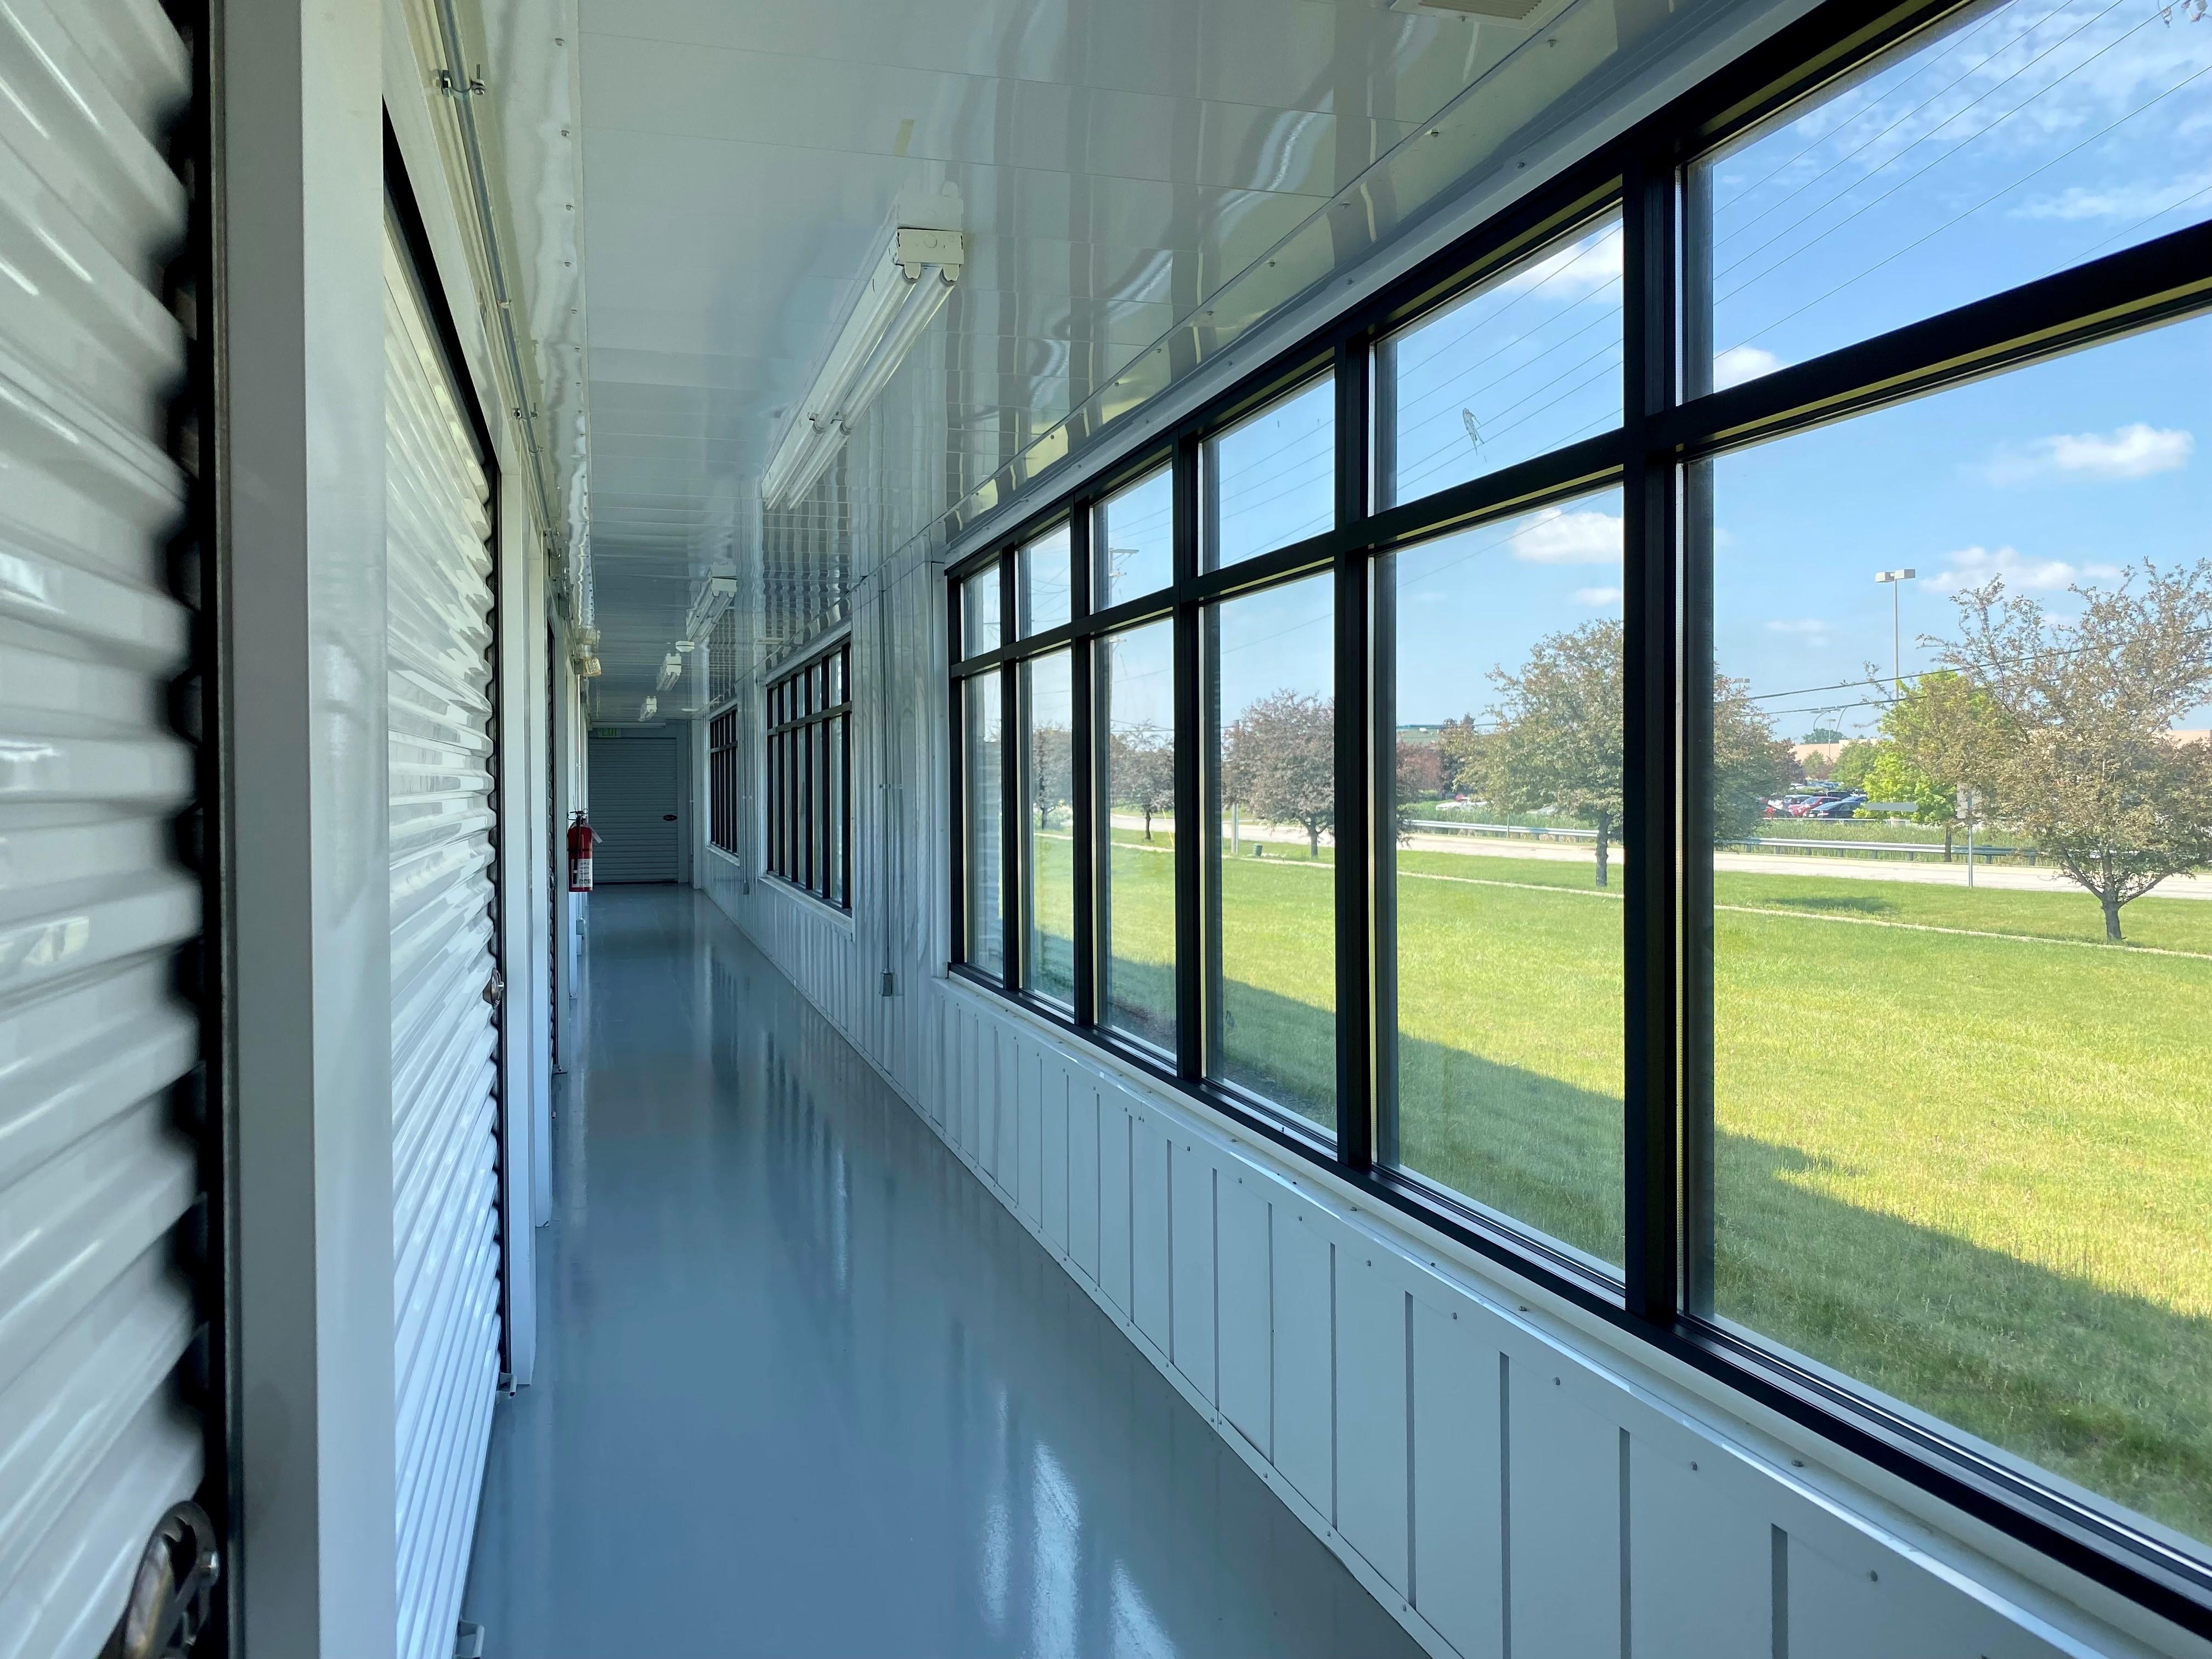 hallway storage units inside of building